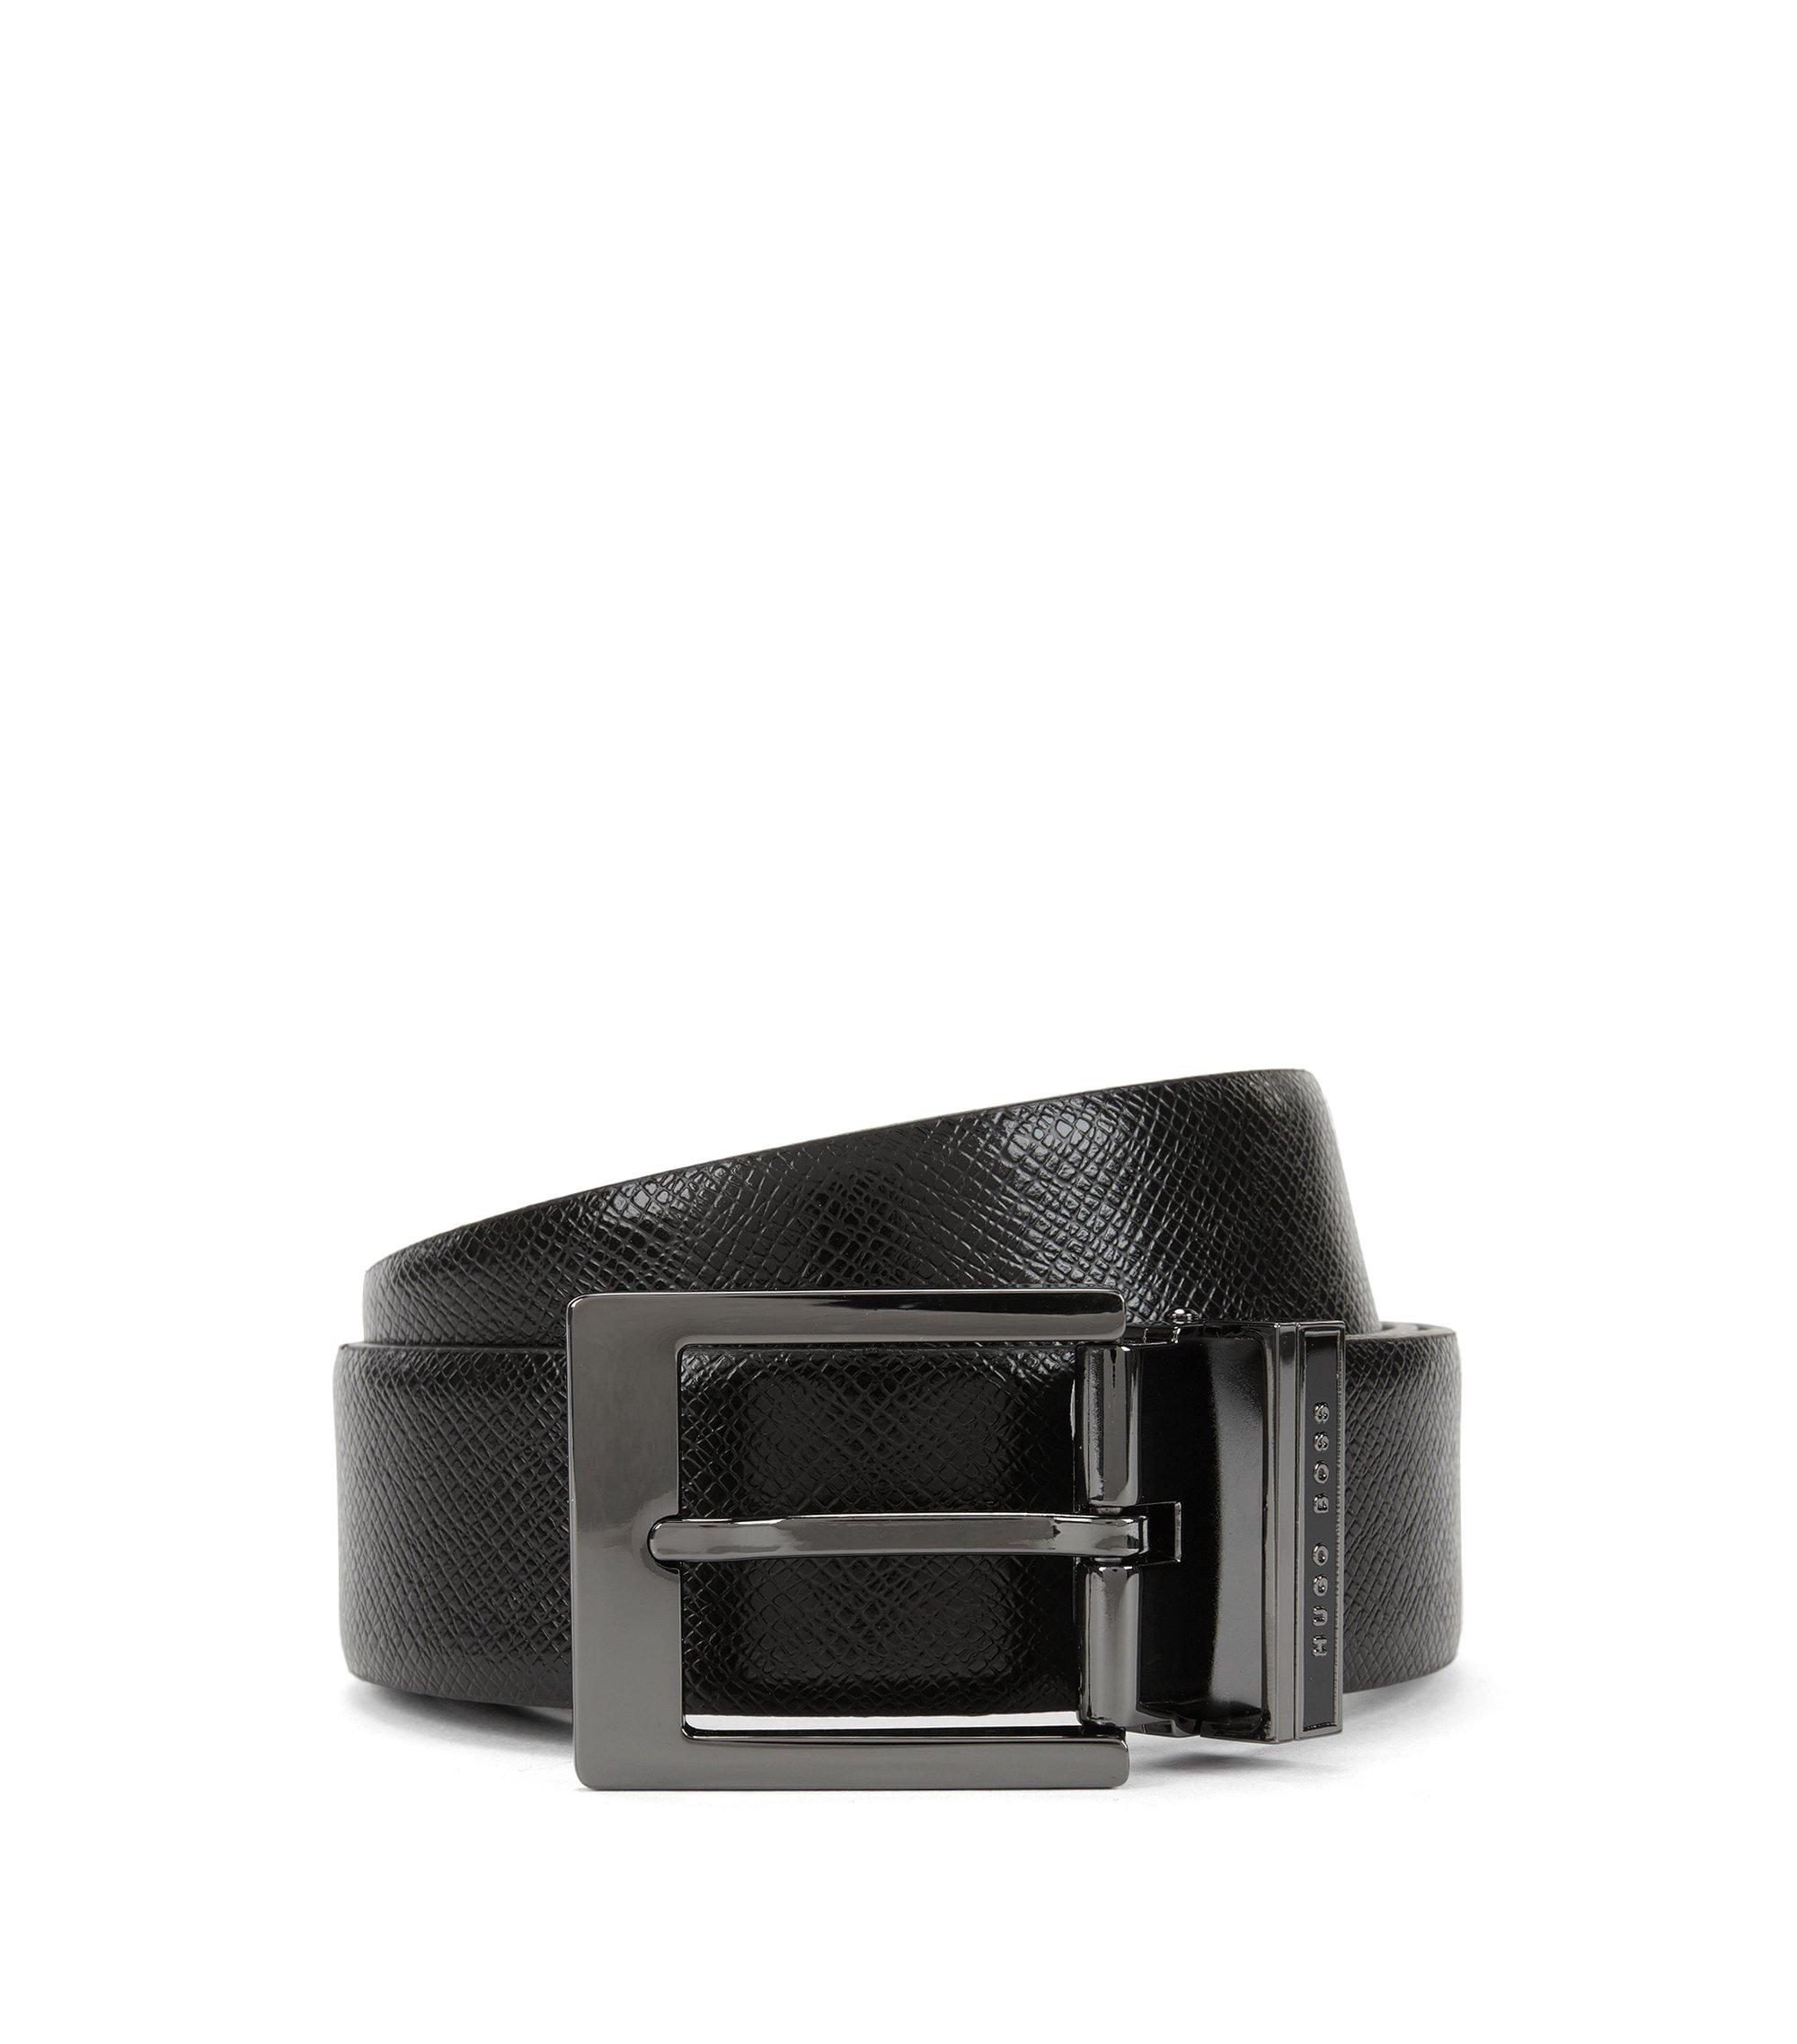 Embossed Leather Belt | Olaf Or35 Ps, Black